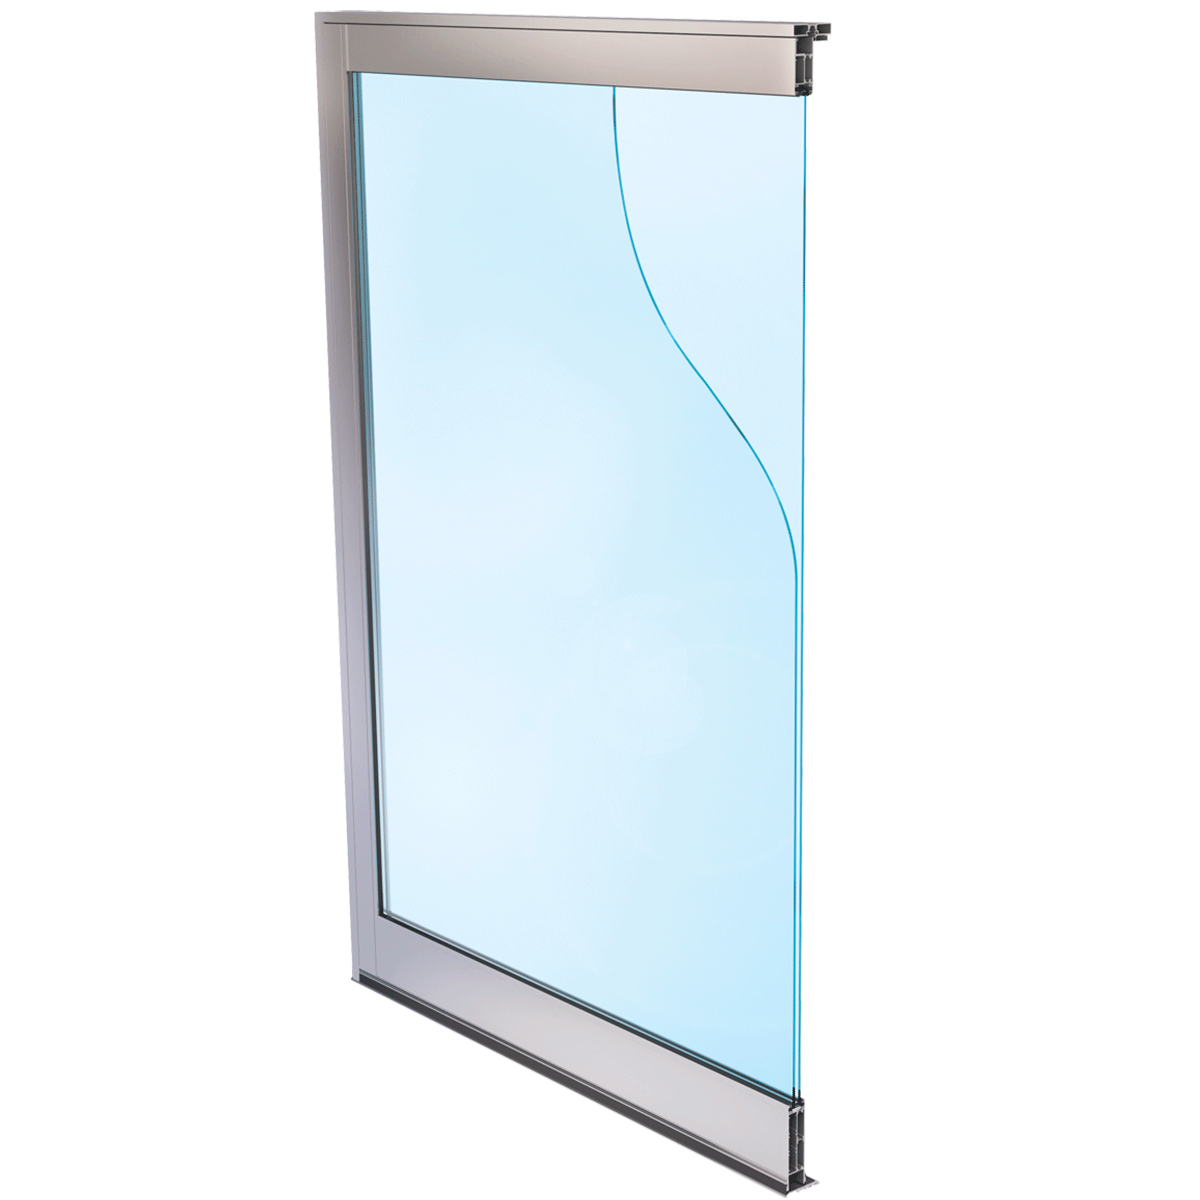 MS-375TC / WS-500 TC Thermal Composite Door & Frame